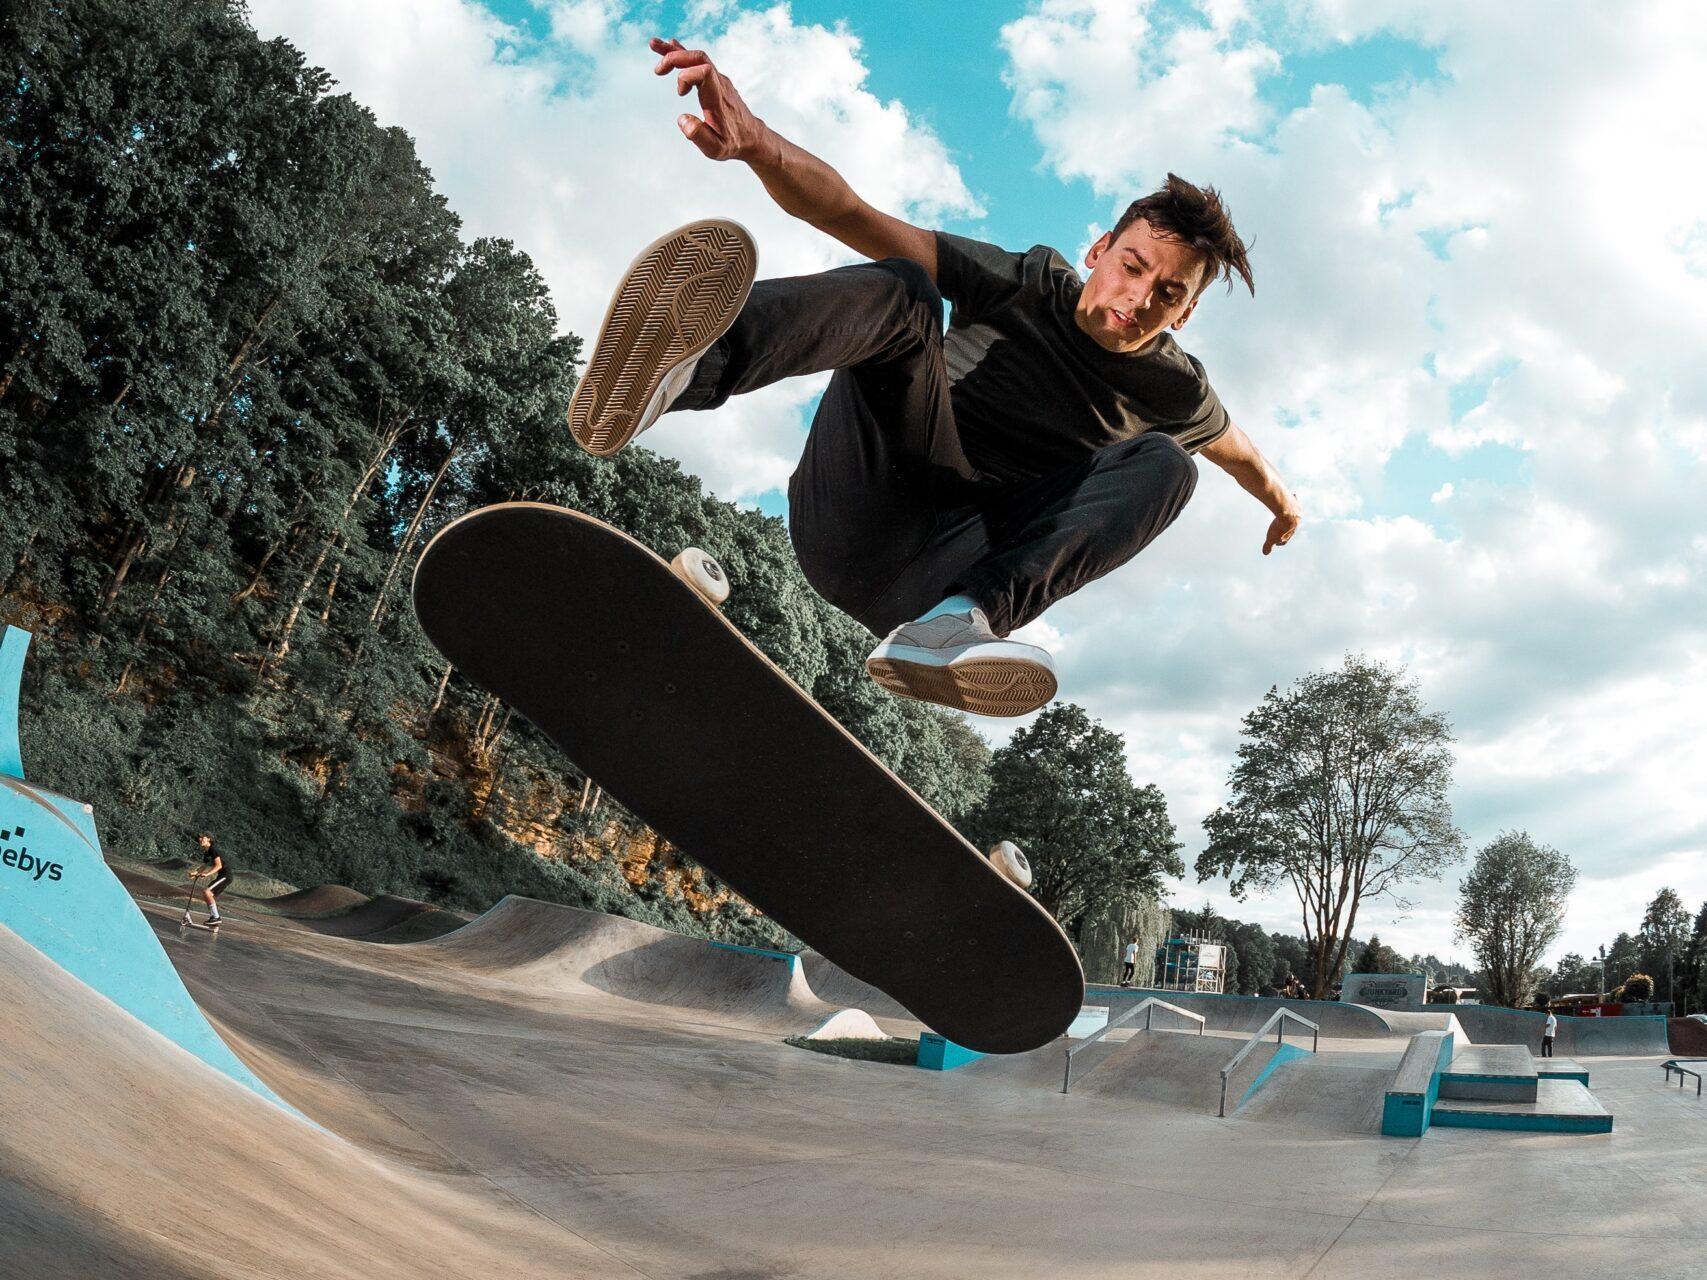 kickflip – beginner skate tricks   Skate The States